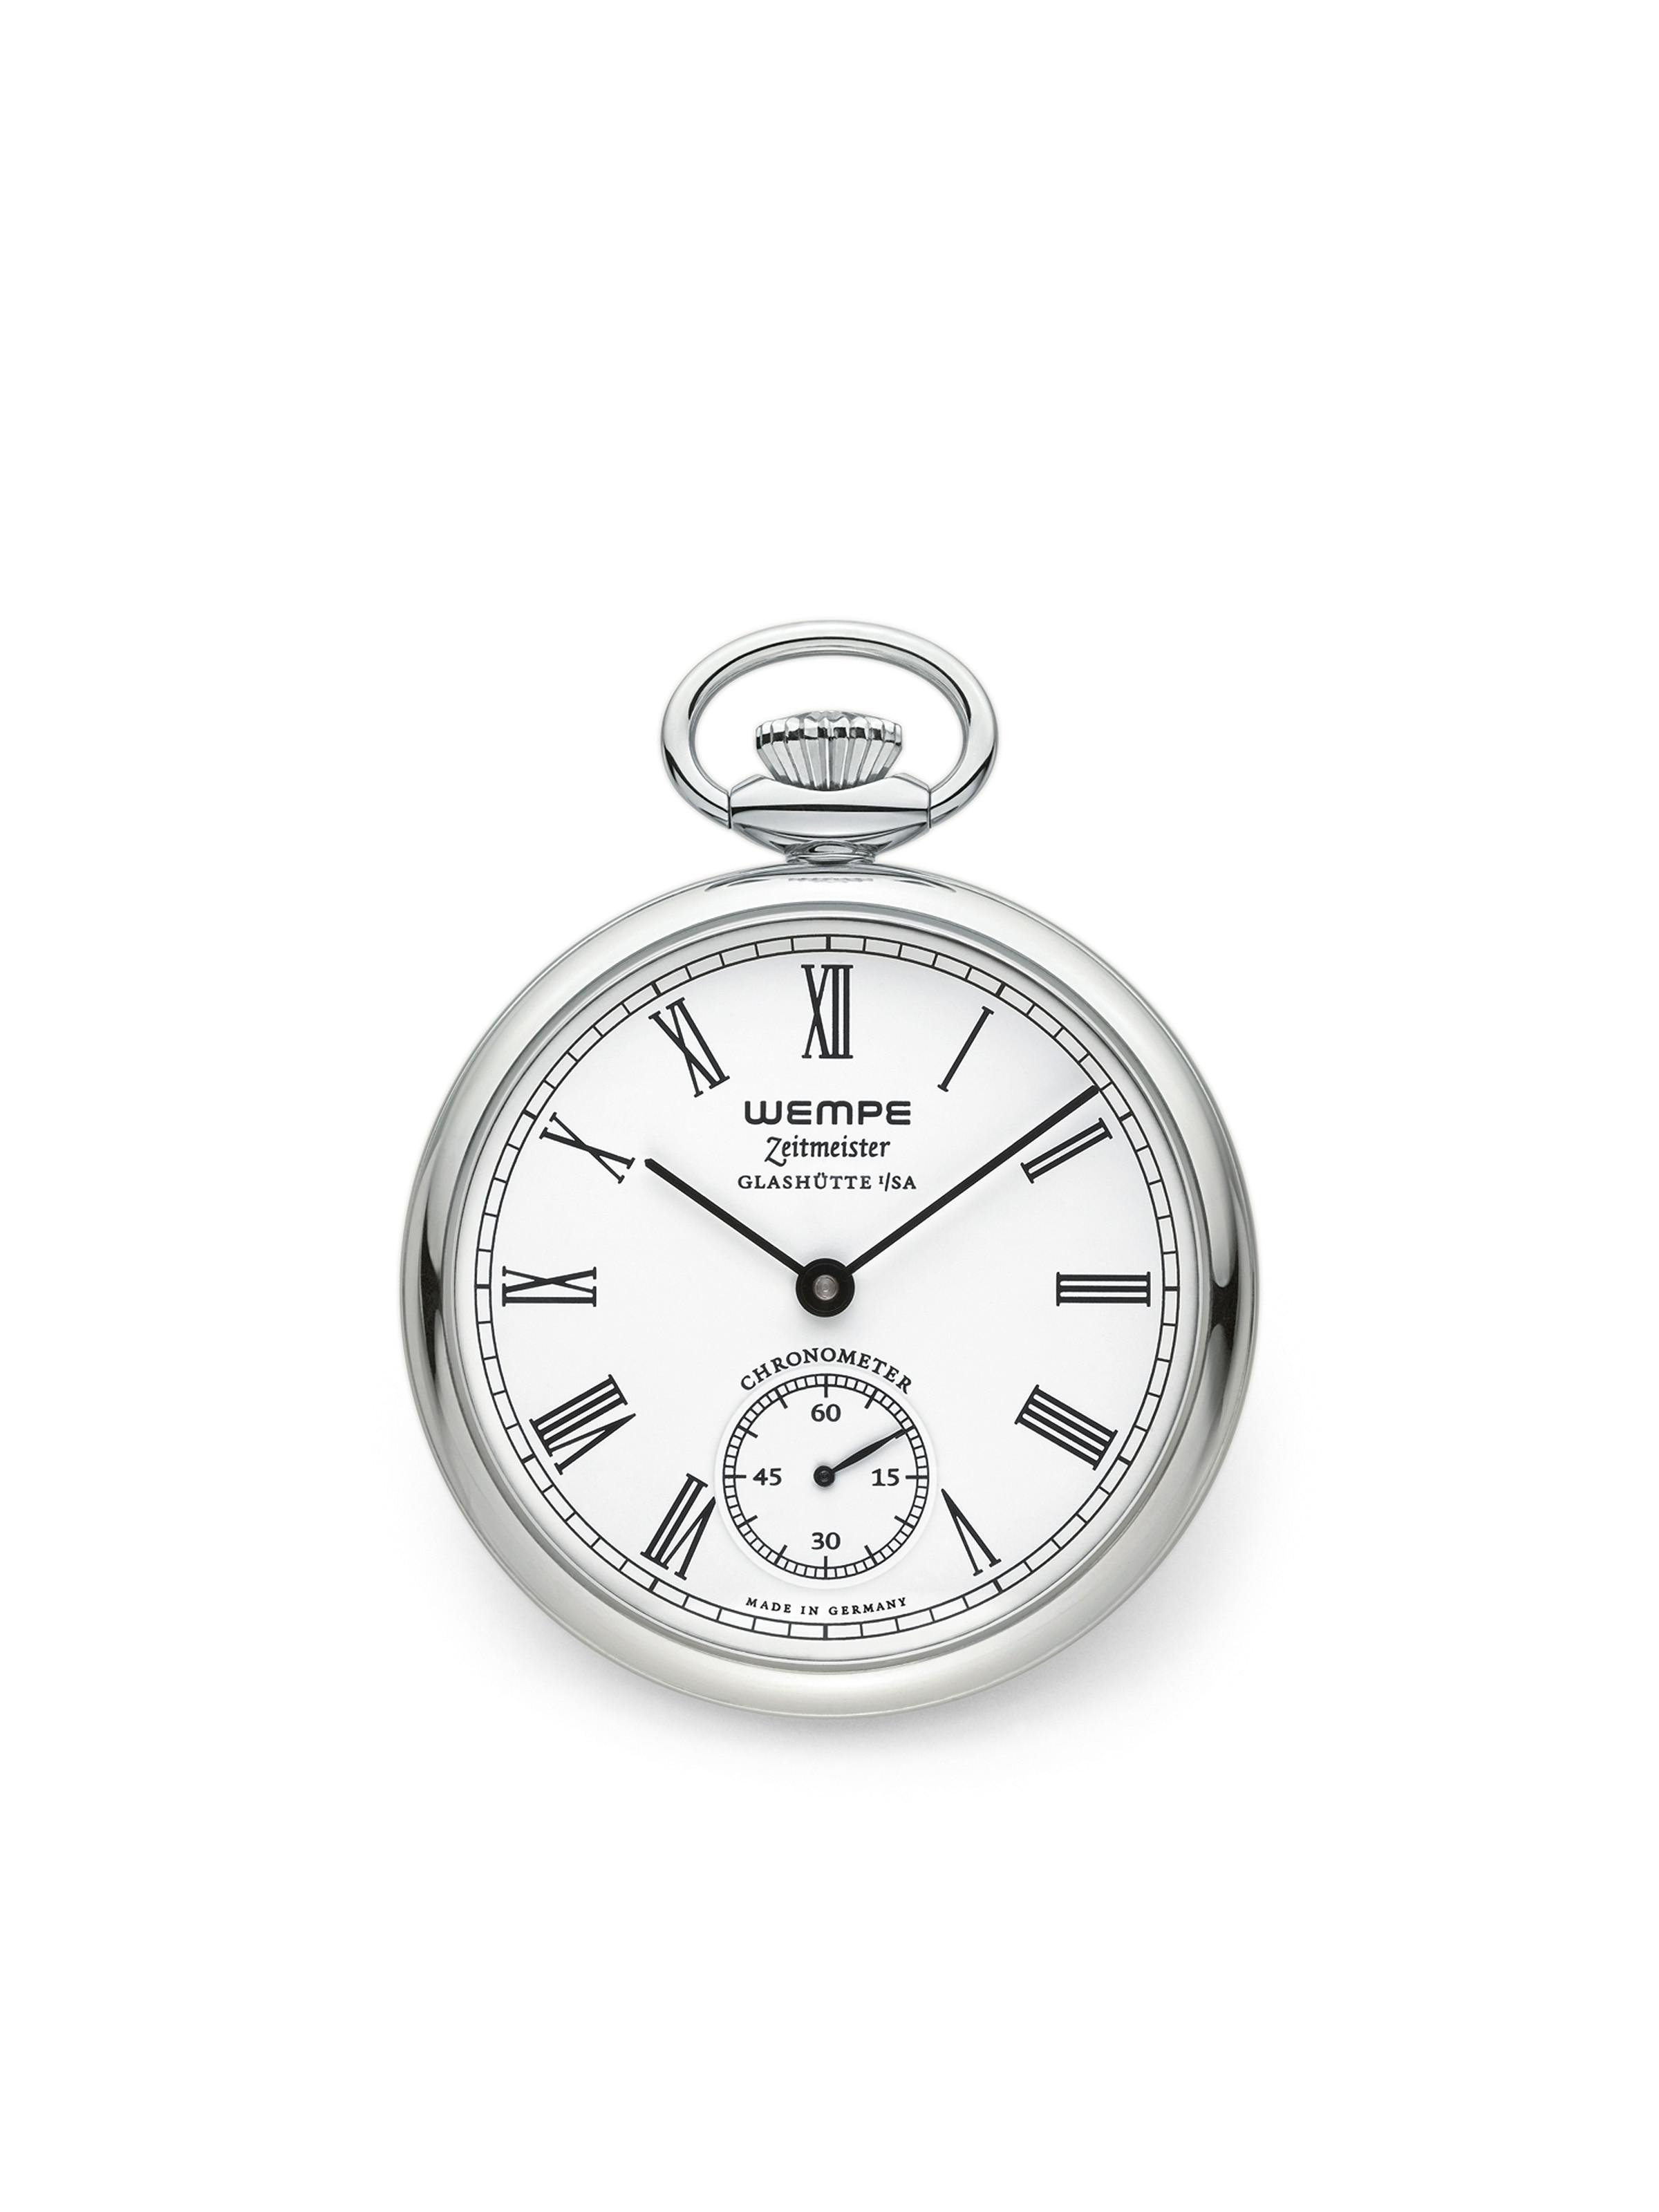 Zeitmeister Pocket Watch Lépine